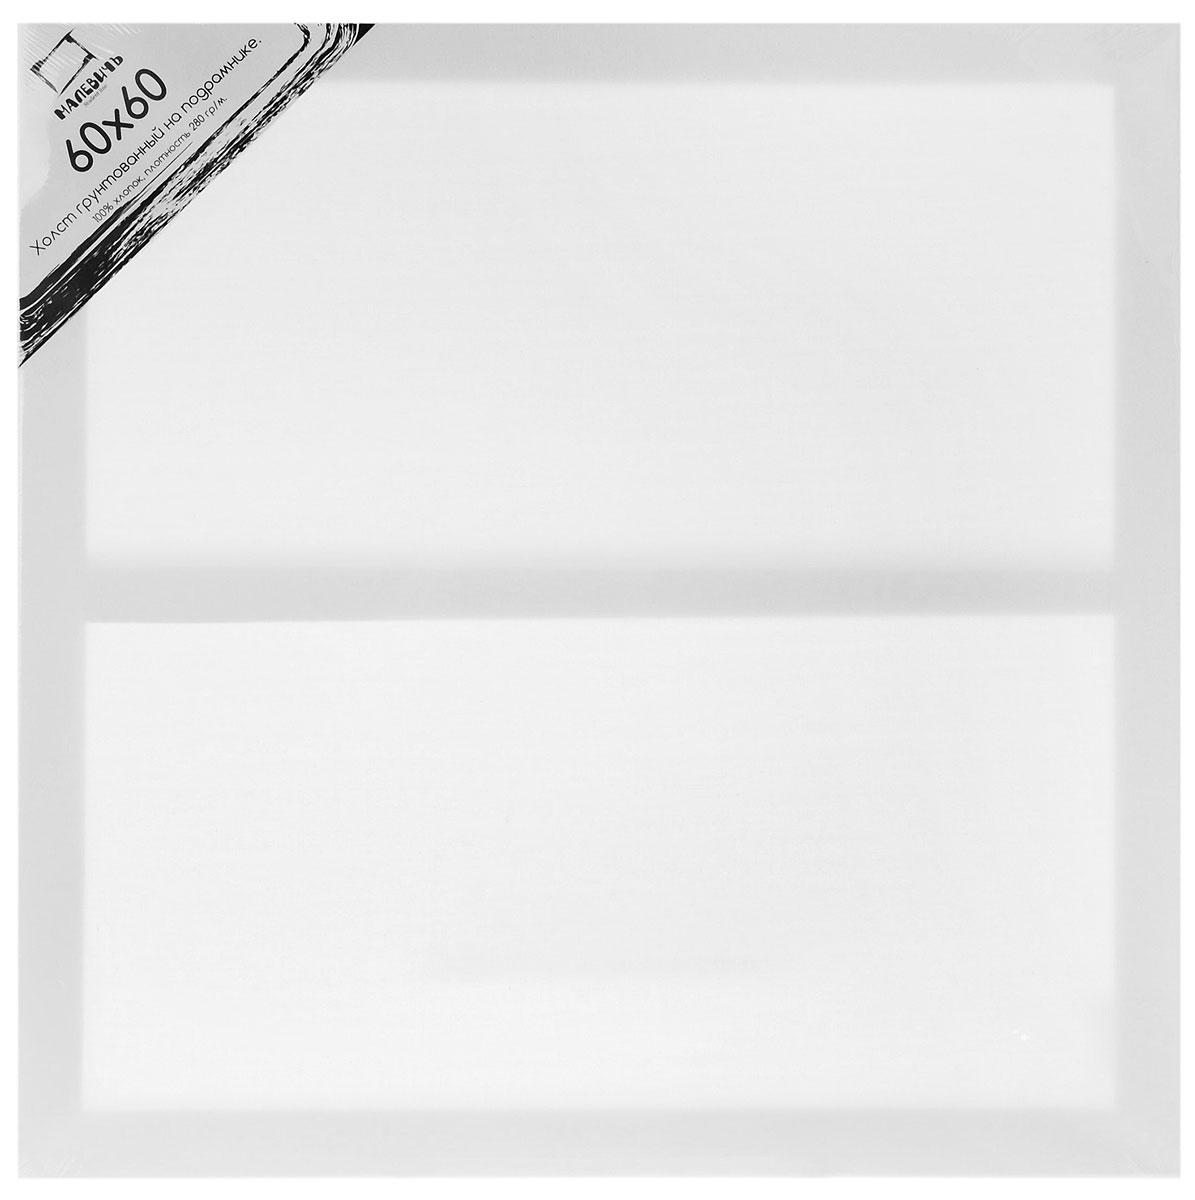 Малевичъ Холст на подрамнике 60 см x 60 см 280 г/м2